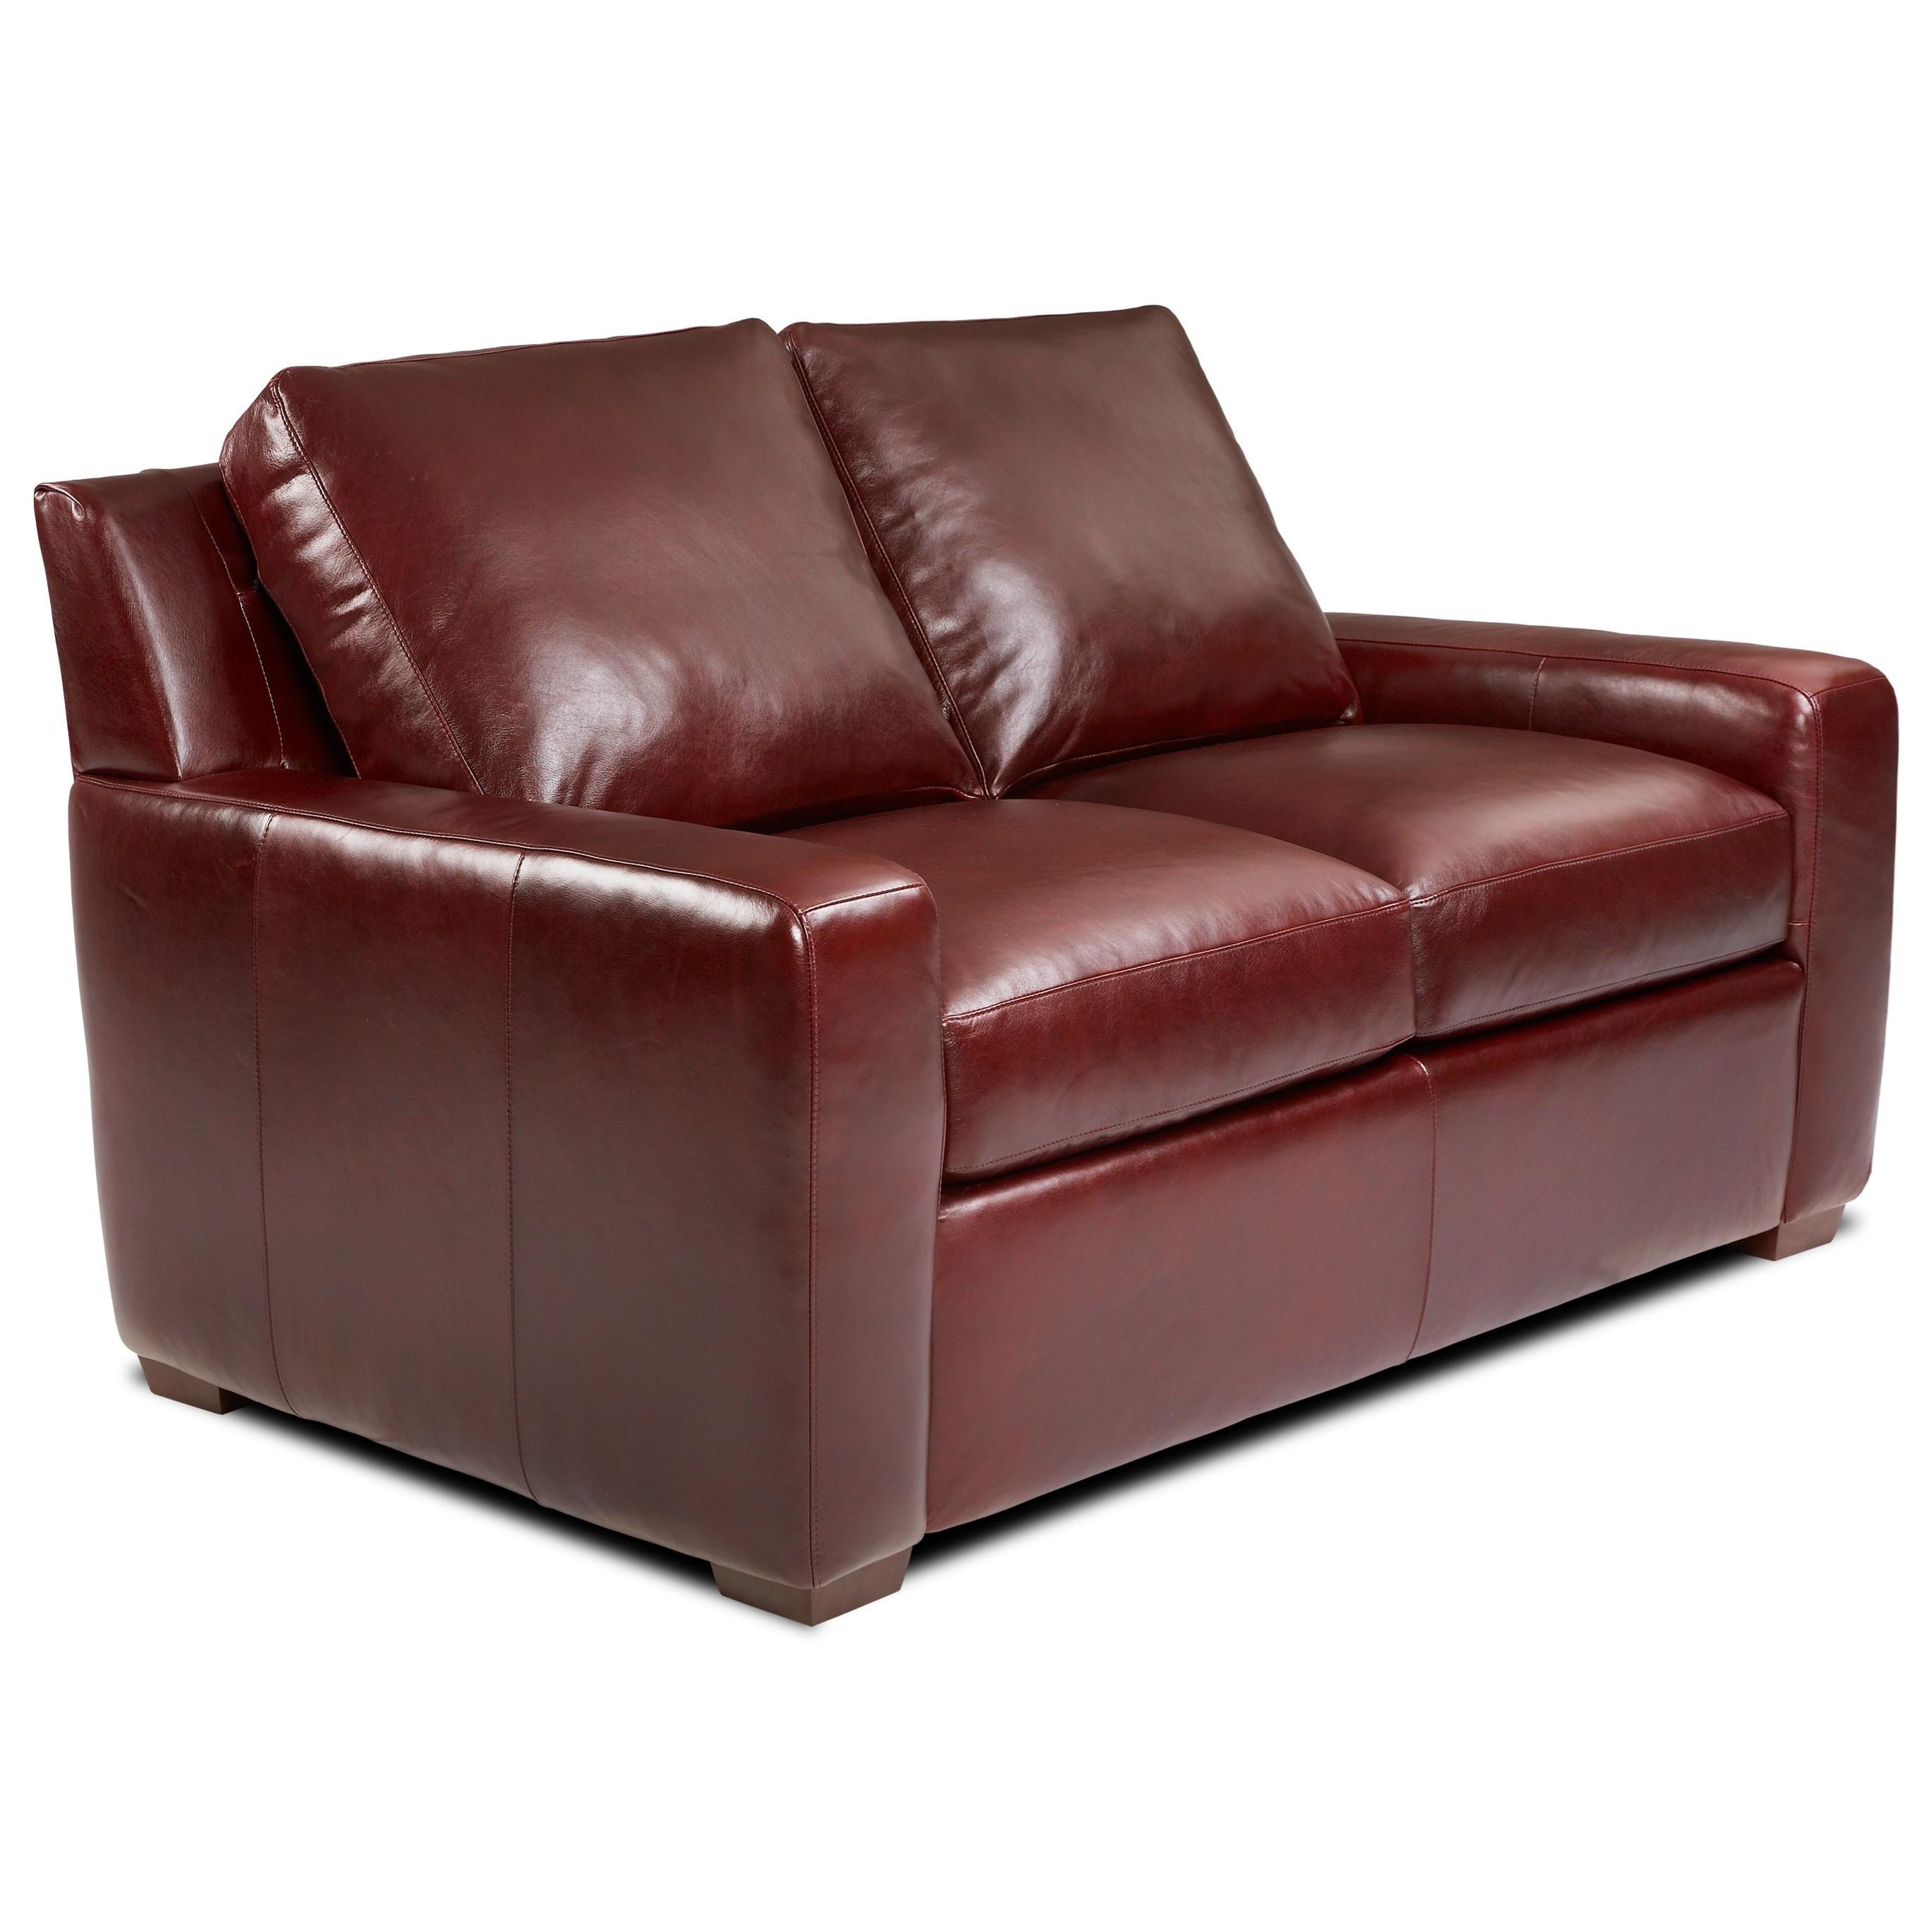 Lisben Loveseat by American Leather at Sprintz Furniture